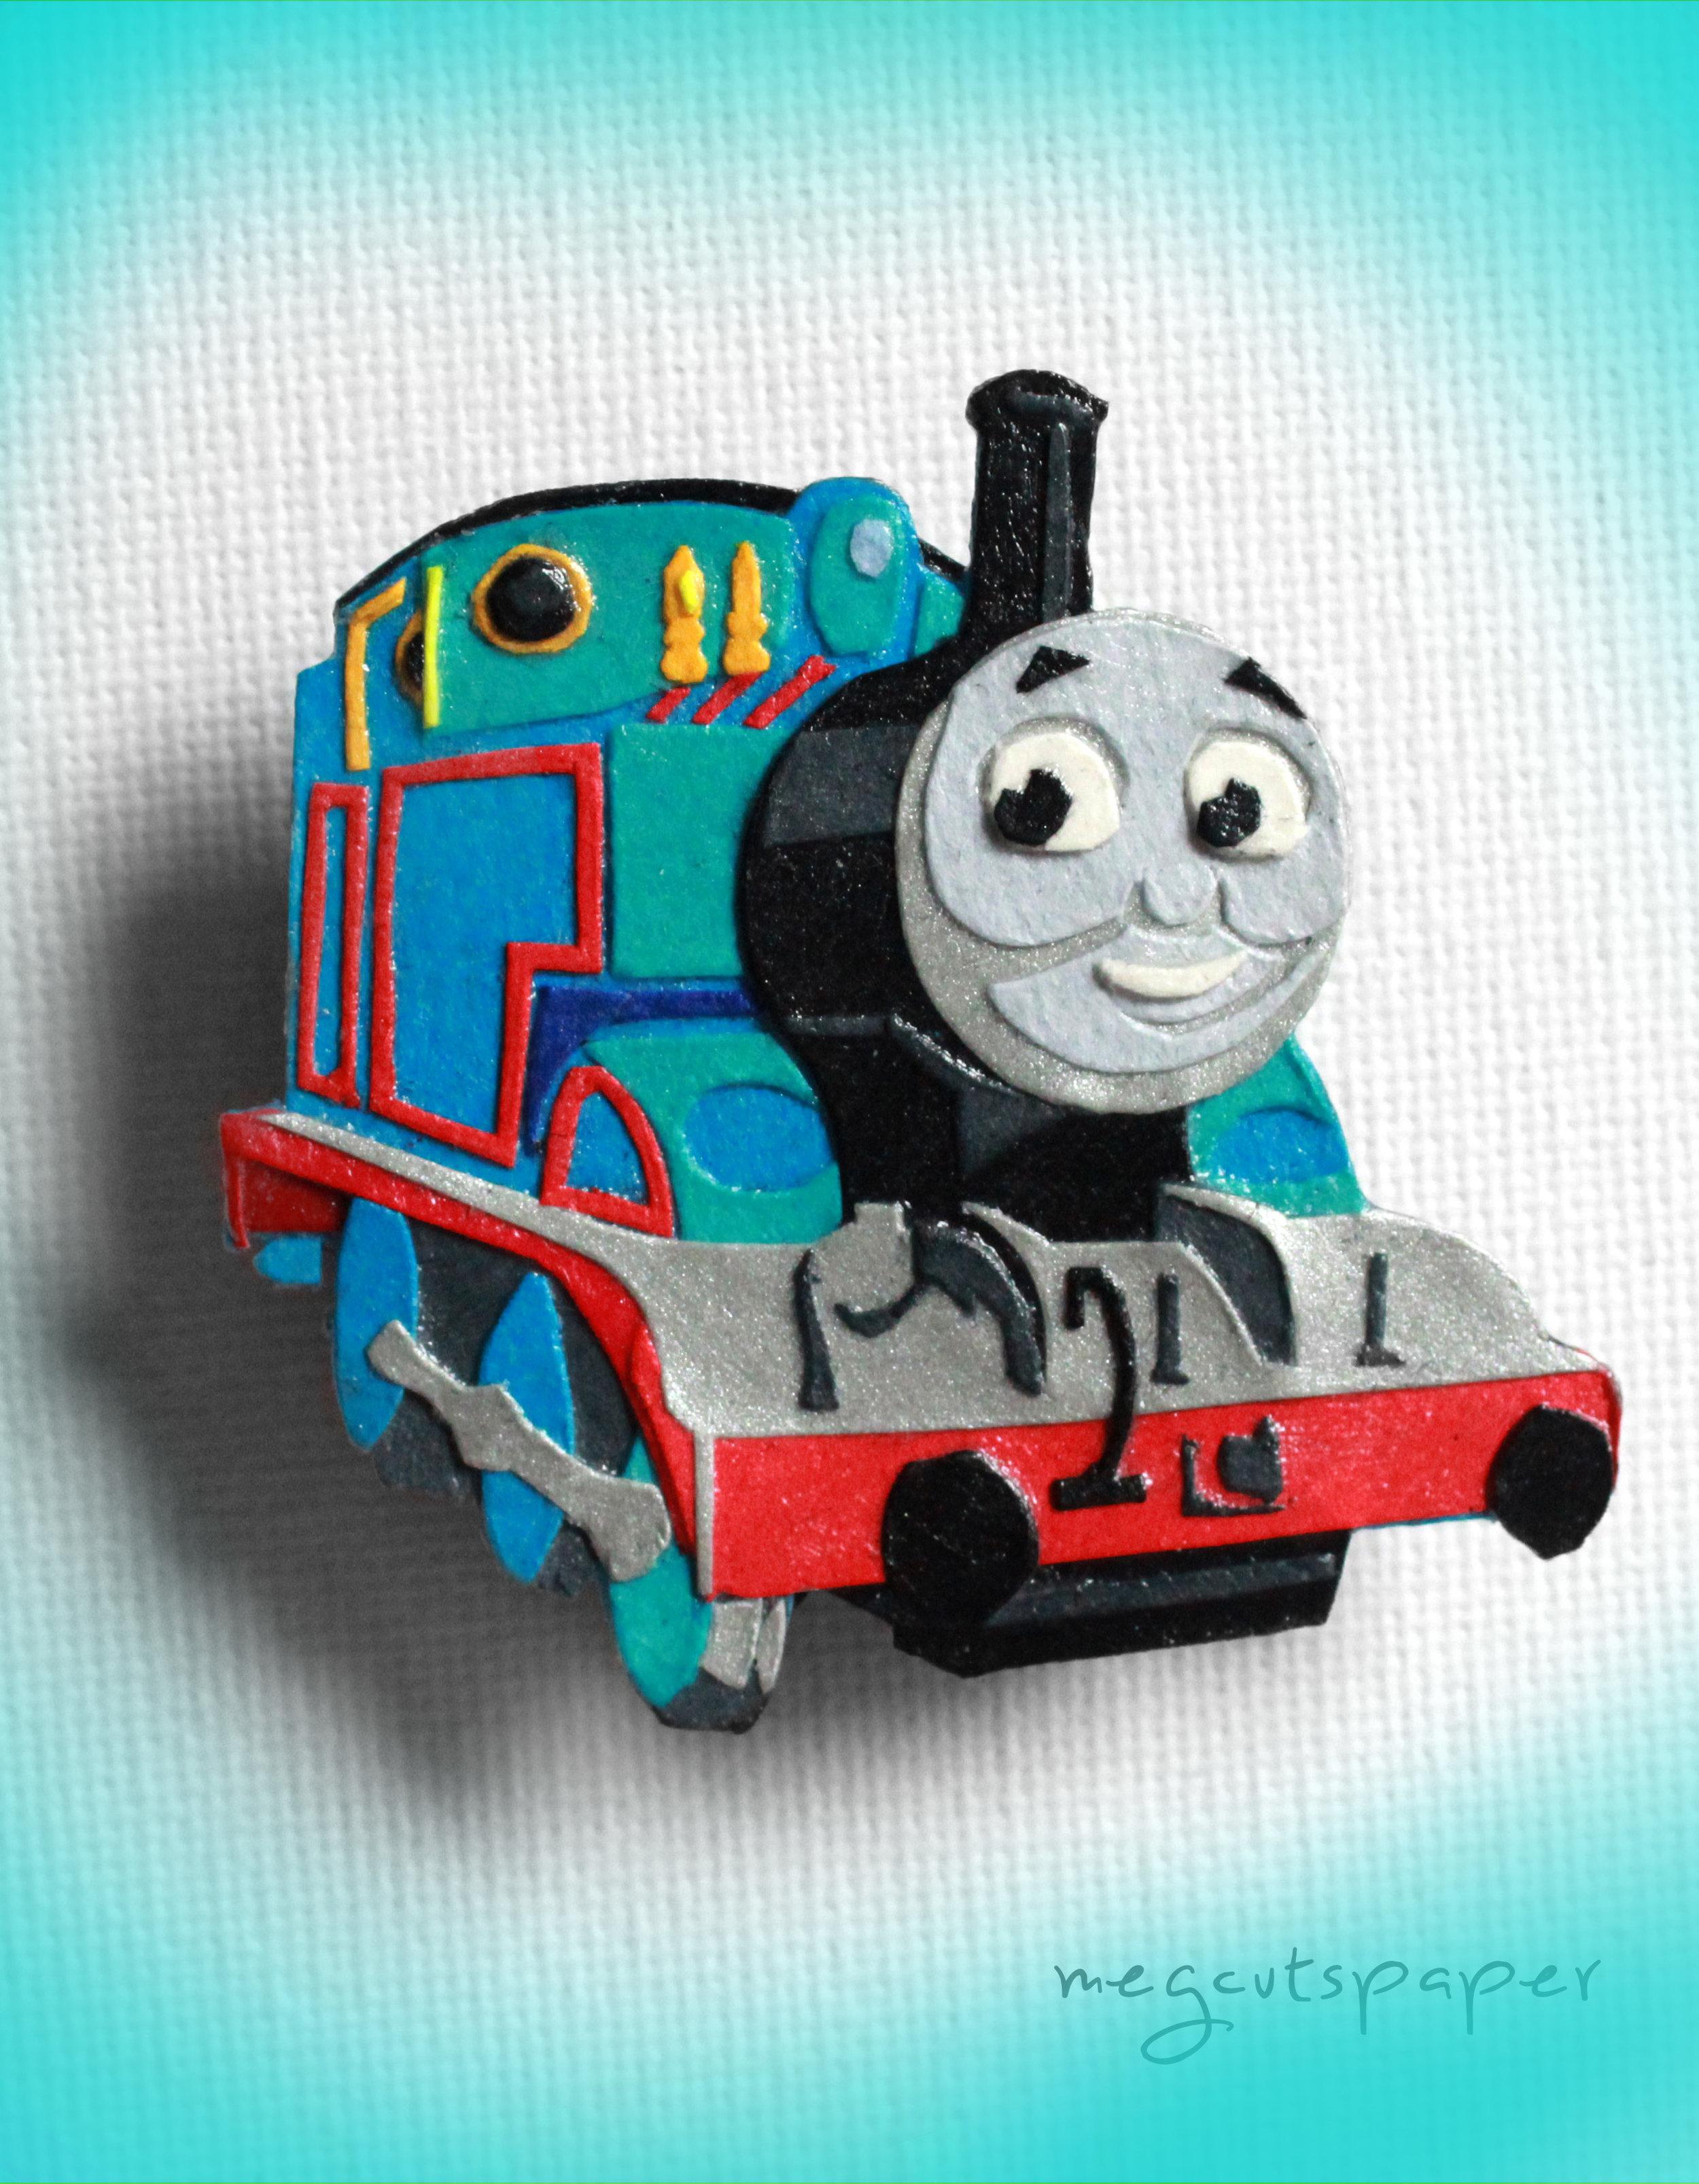 Megcutspaper_ThomasTheTankEngine_Train_Manget.jpg